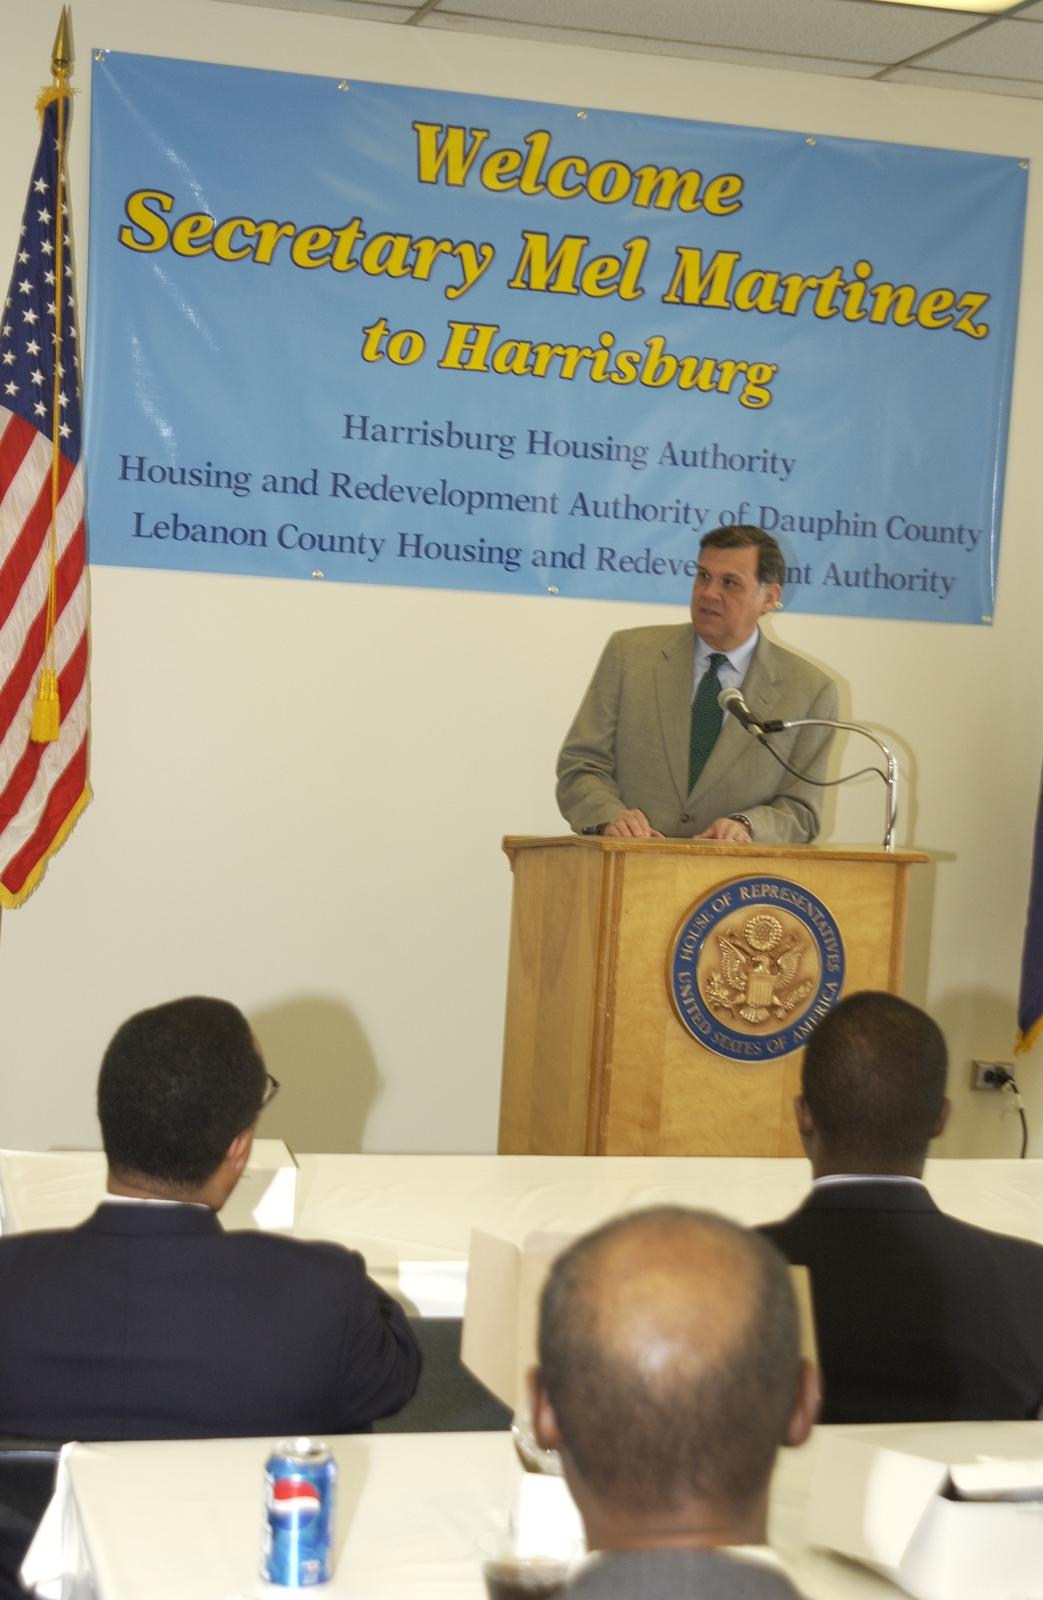 Seccretary Mel Martinez in Harrisburg, Pennsylvania